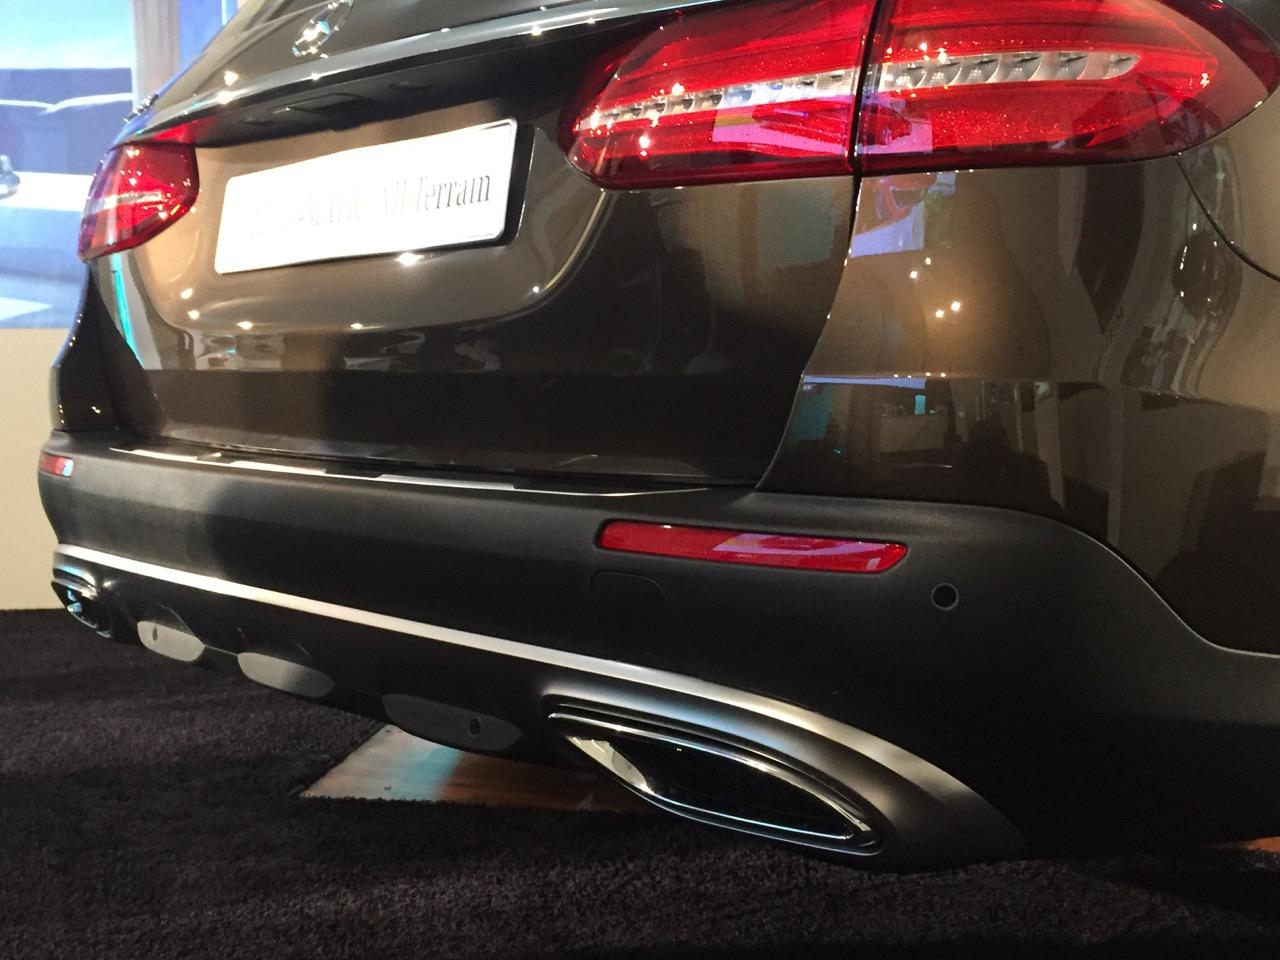 Mercedes-Benz Classe E 4MATIC All-Terrain - anteprima italiana